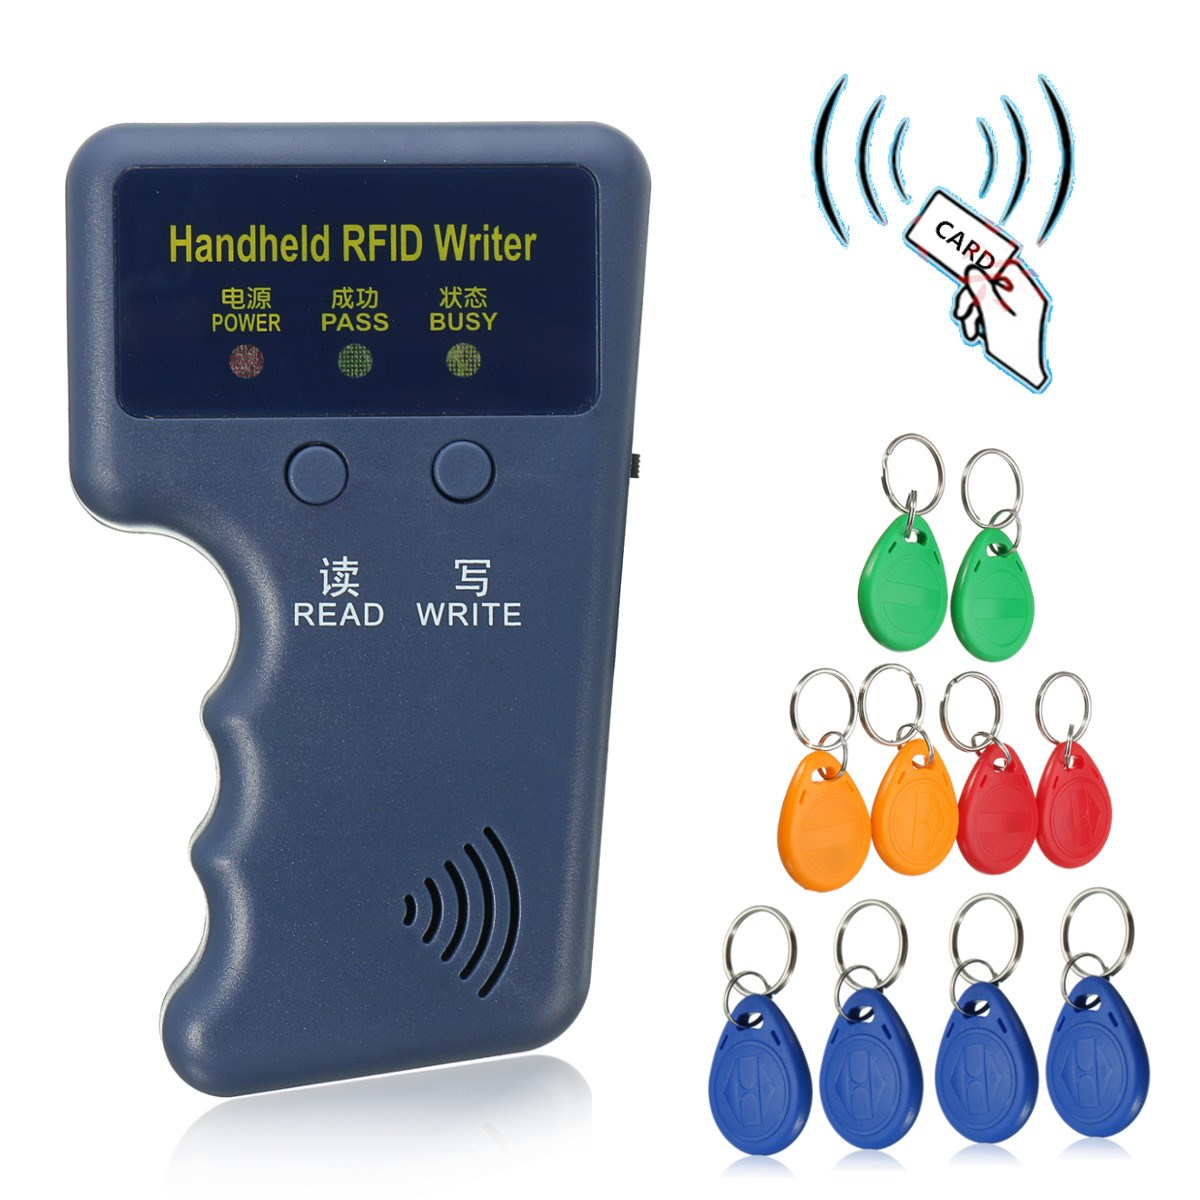 Handheld 125 KHz EM4100 RFID Copier Writer Duplicator Programmatore Reader + 10 Pz Riscrivibile ID Keyfobs EM4305 T5577 Tag Carta